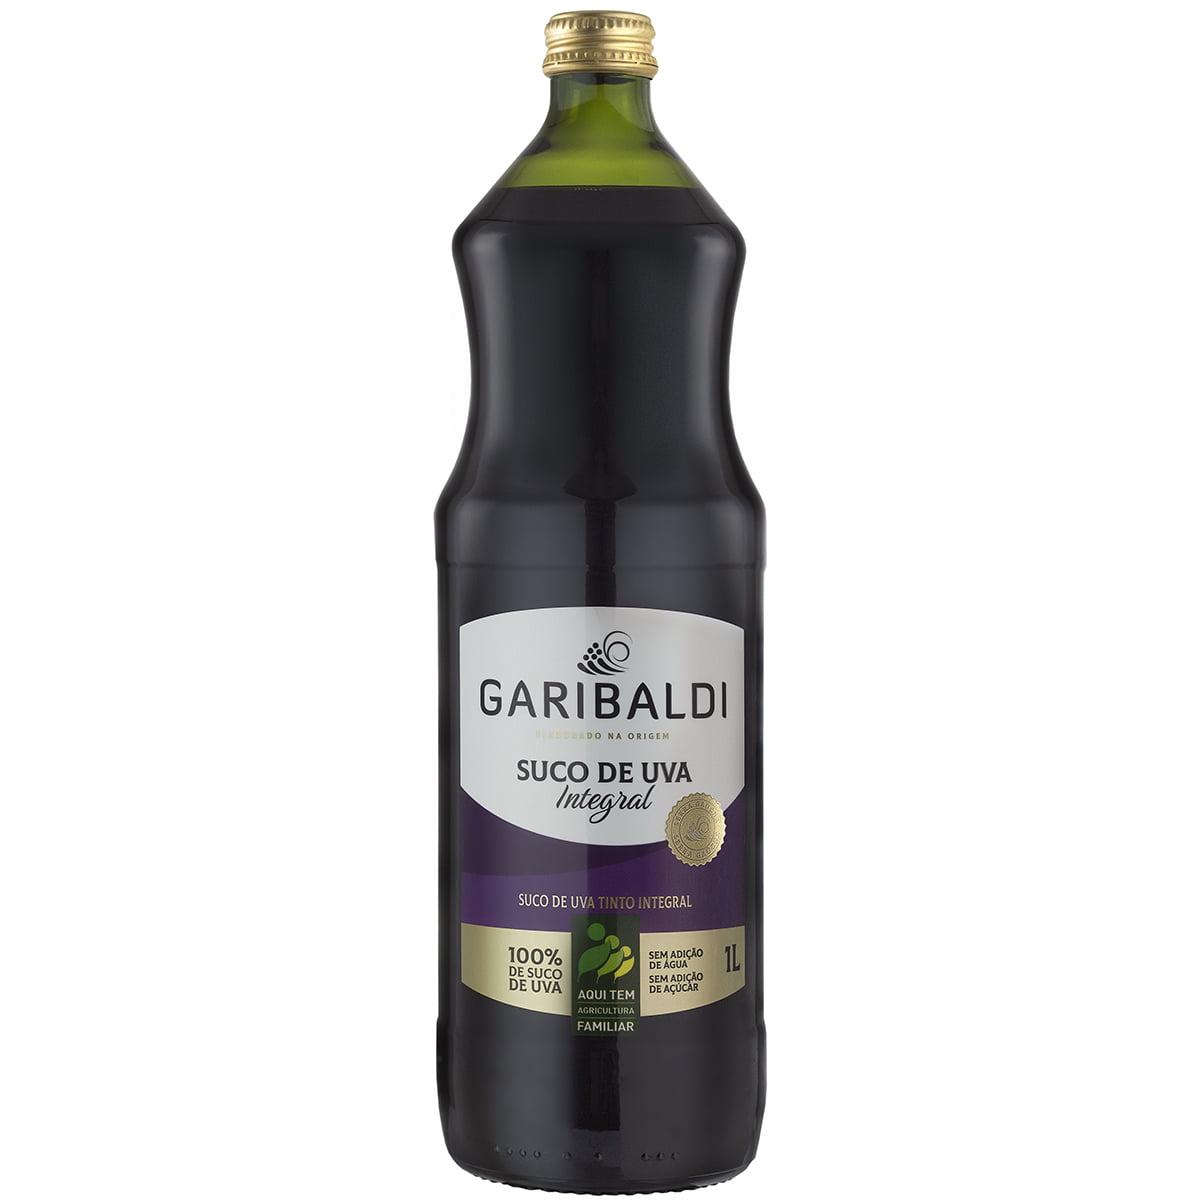 Suco de Uva Garibaldi Tinto Integral 1Lt